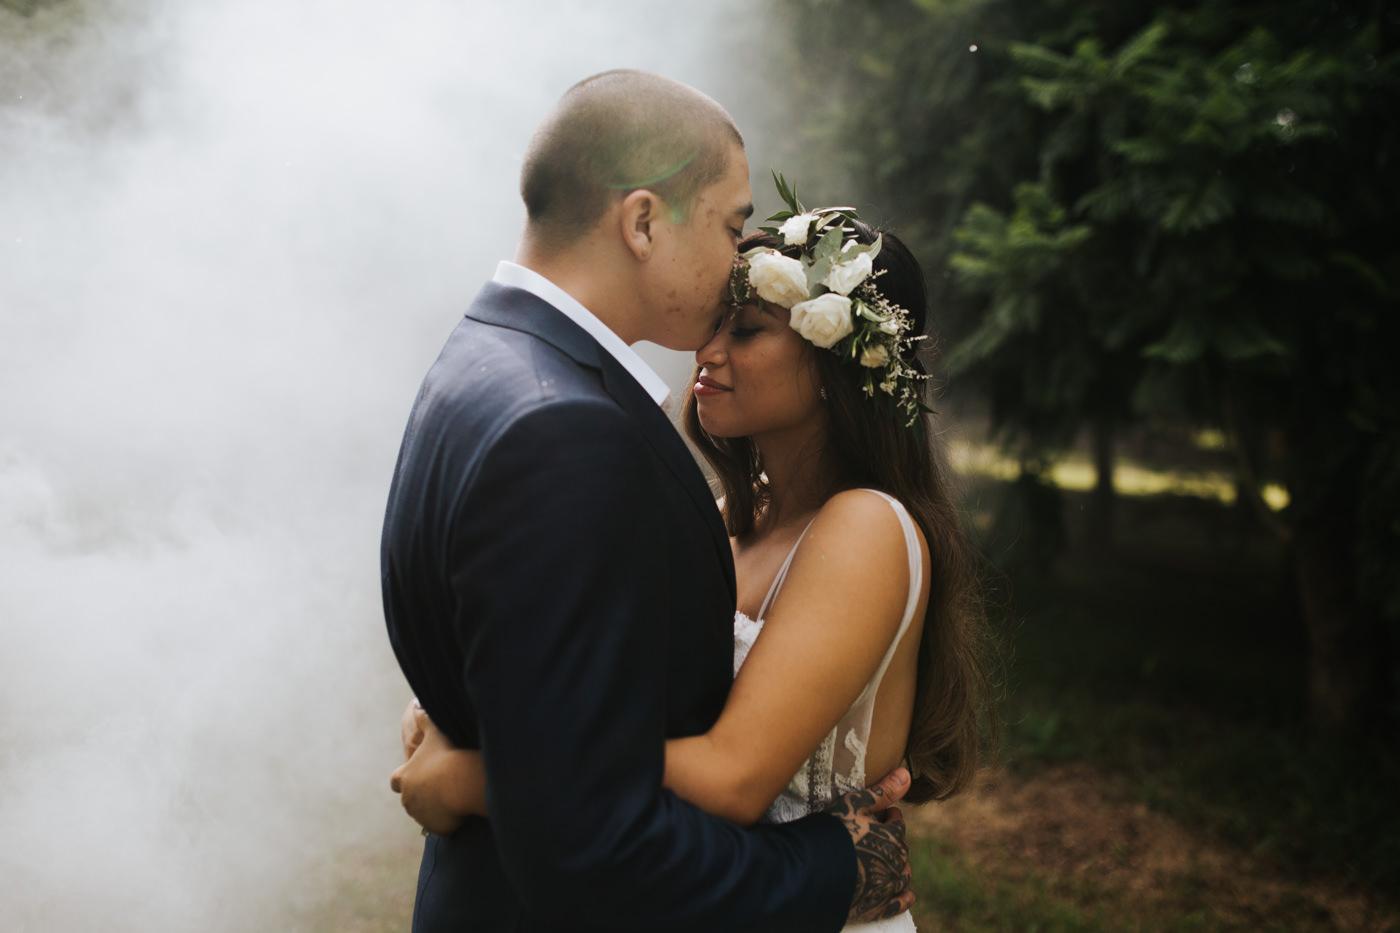 Nick & Vanezza - Fernbank Farm Wedding - Samantha Heather Photography-124.jpg